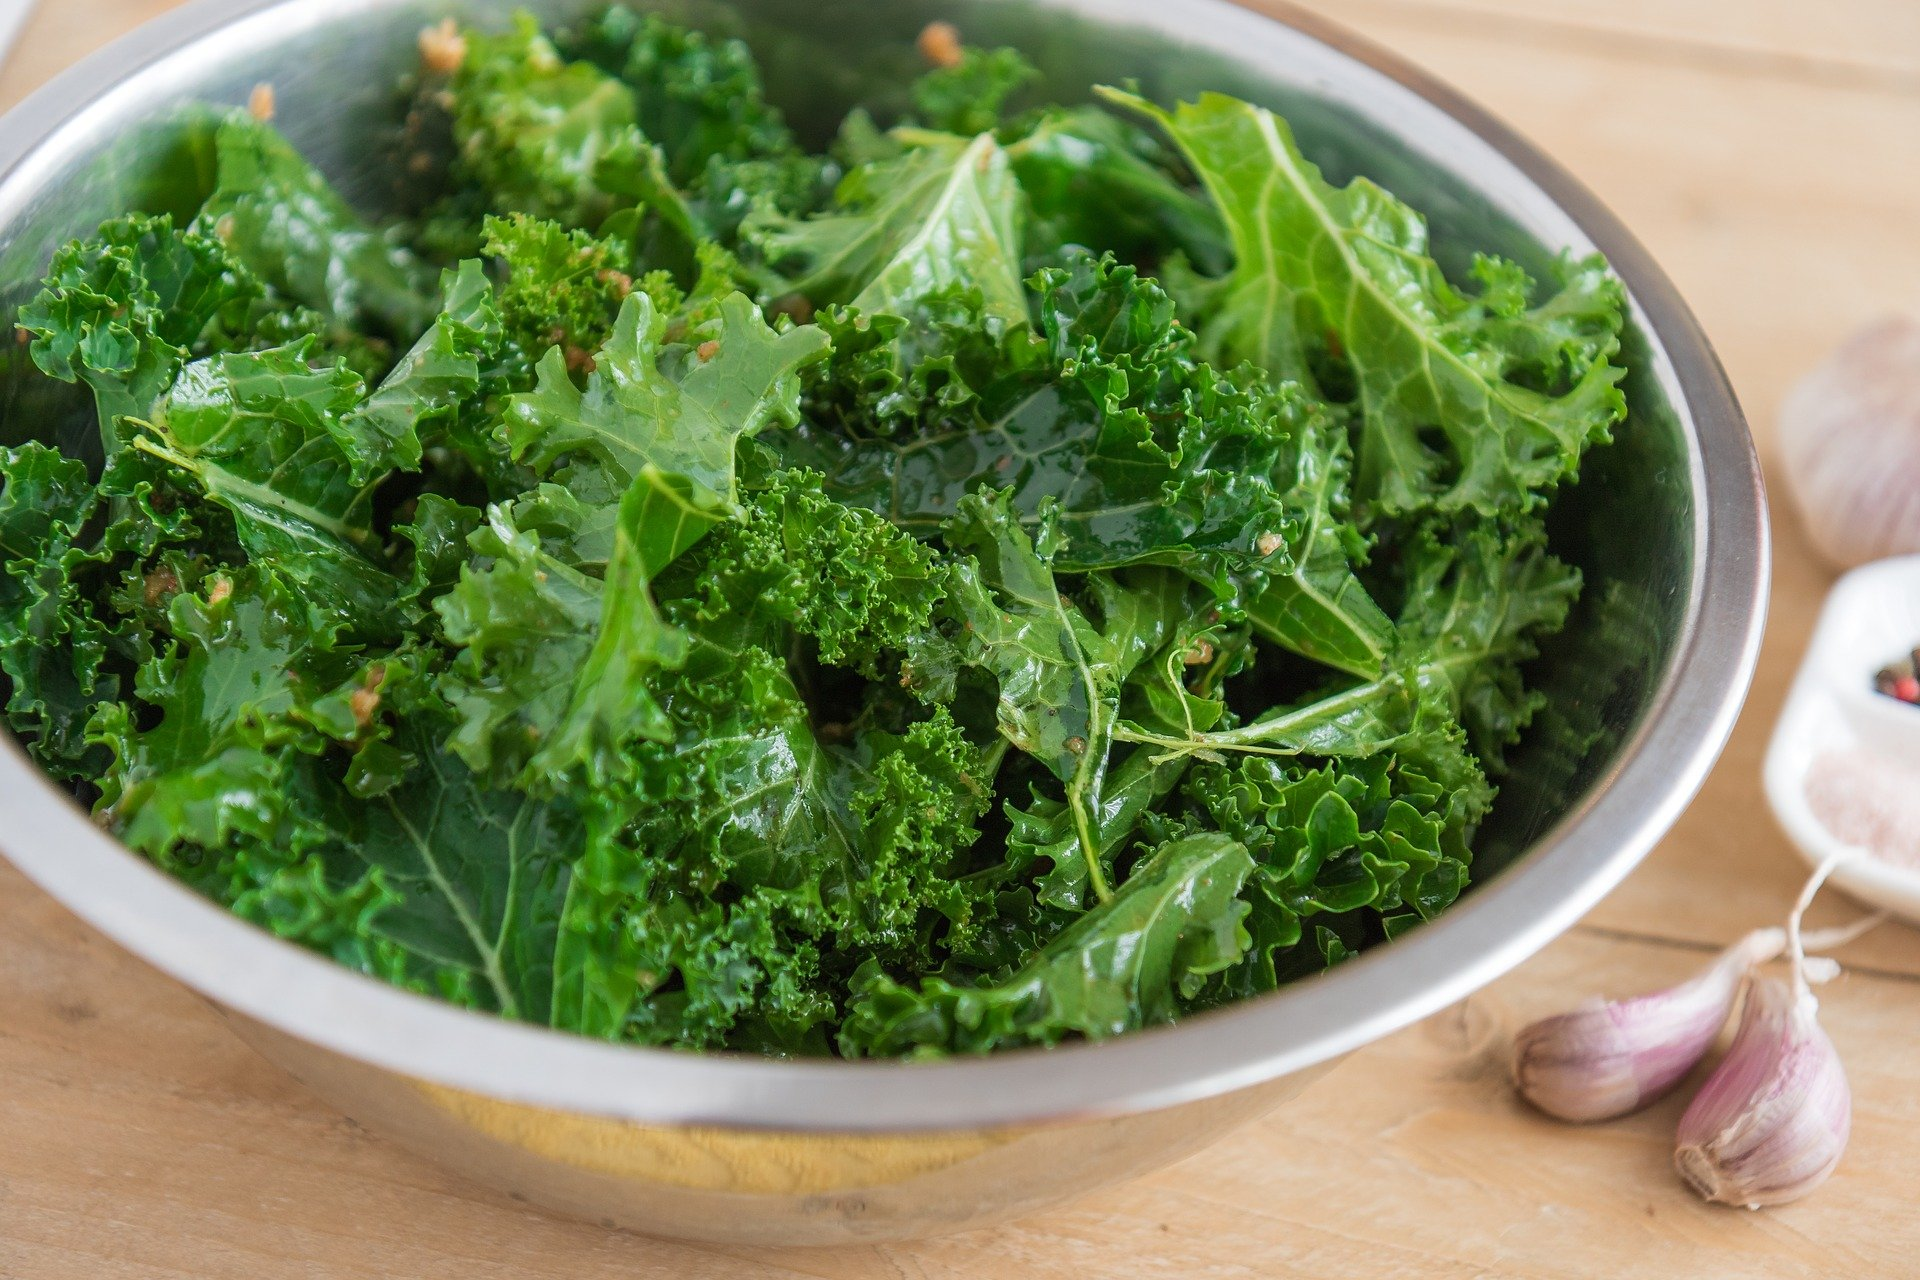 Garlic and Chili Kale crisps- Gluten free crisps